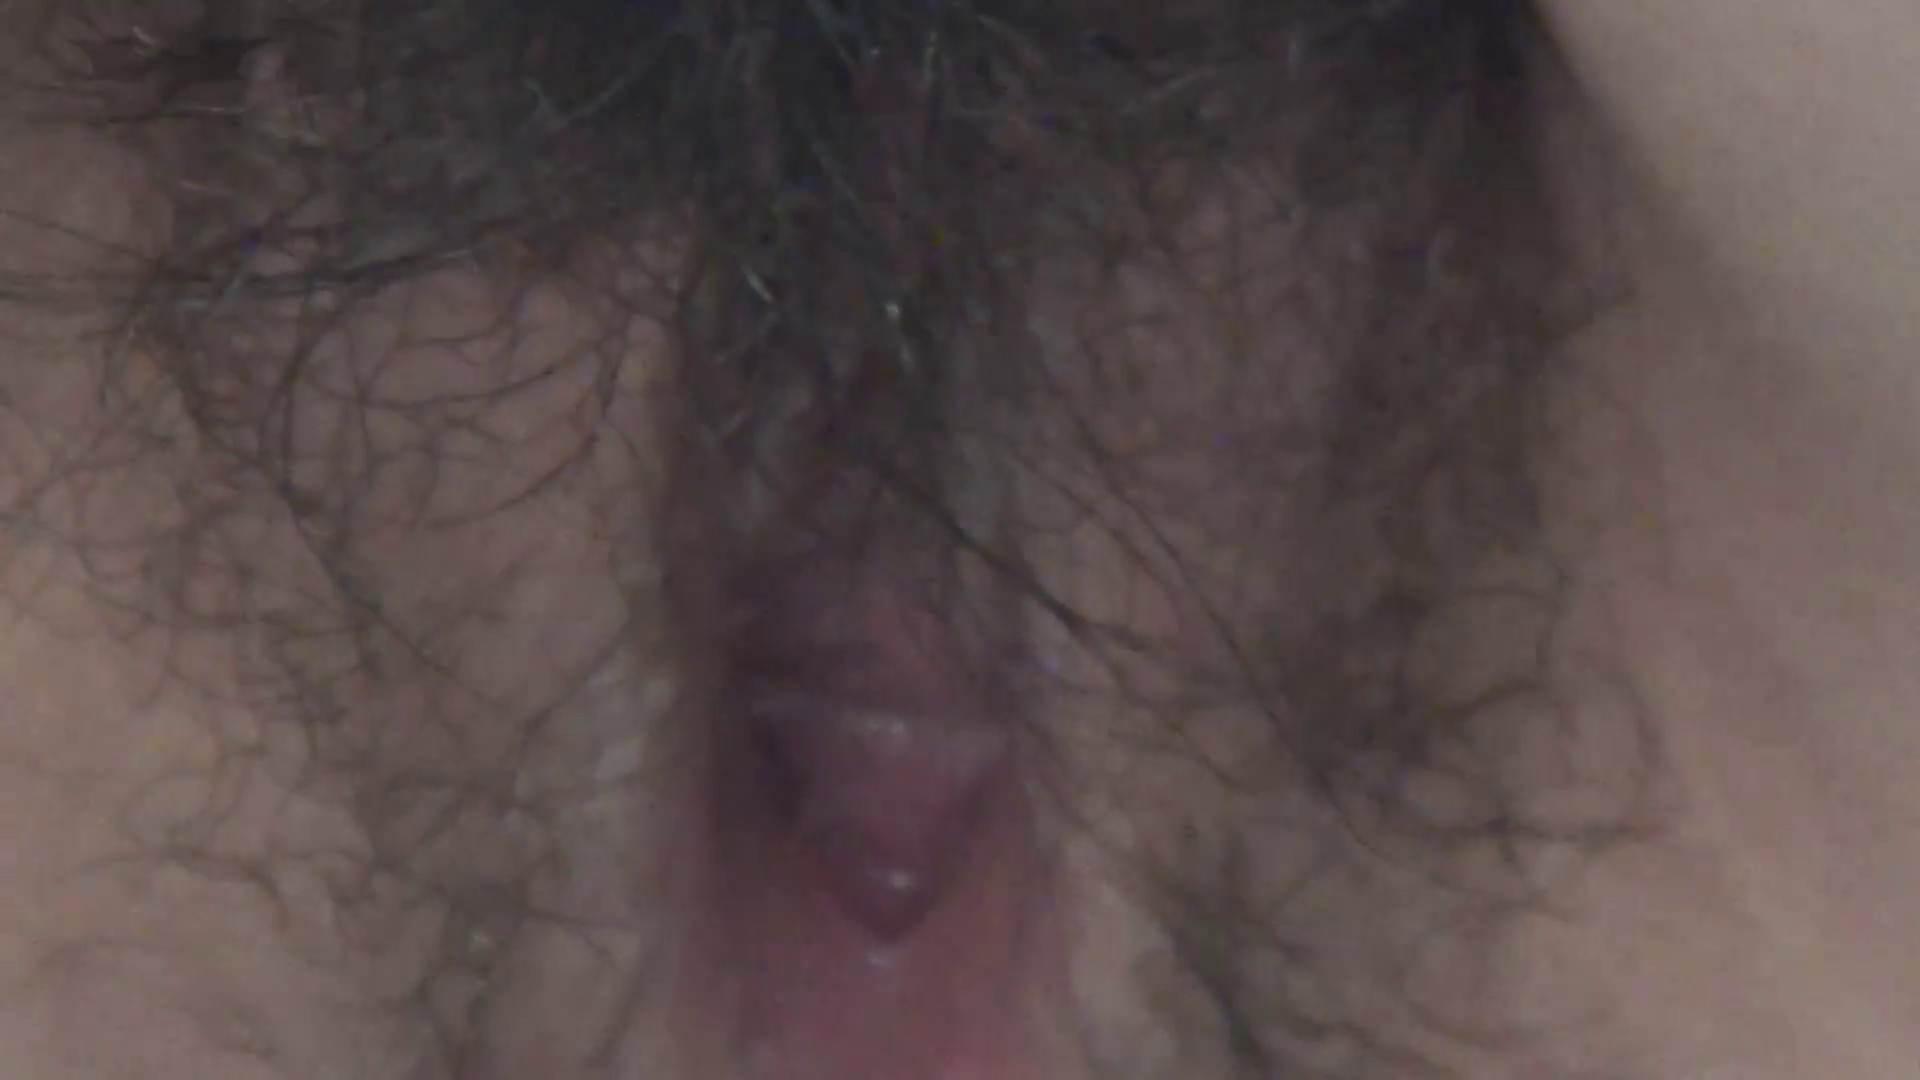 JD盗撮 美女の洗面所の秘密 Vol.38 女性トイレ 盗撮画像 110pic 35